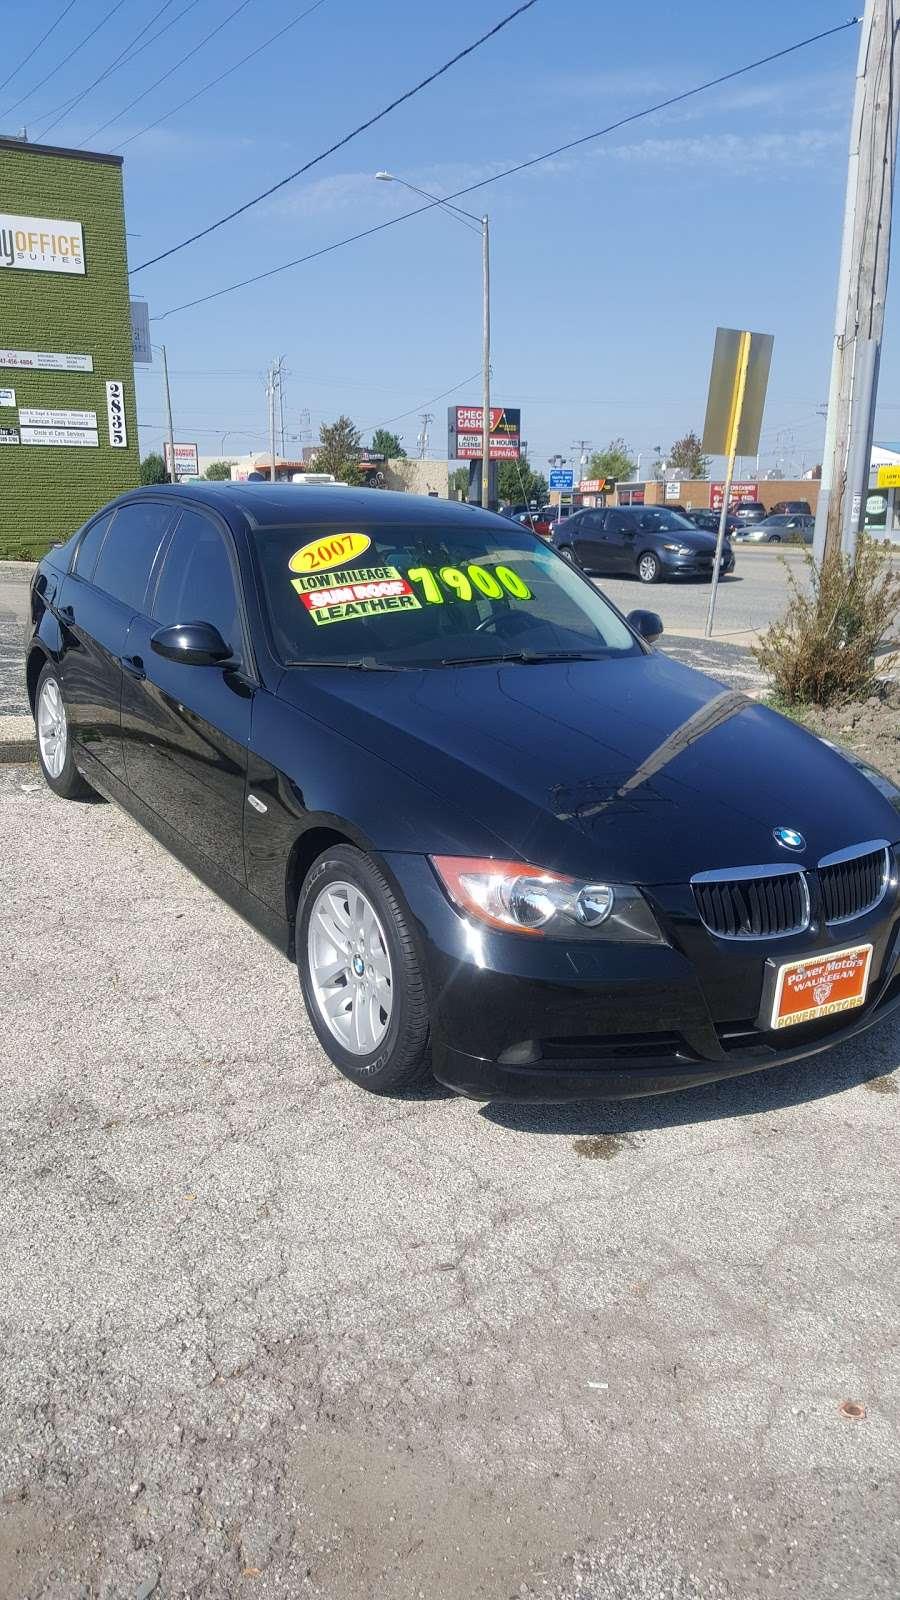 Power Motors Group Inc - car dealer  | Photo 5 of 10 | Address: 2829 Belvidere Rd, Waukegan, IL 60085, USA | Phone: (847) 625-6900